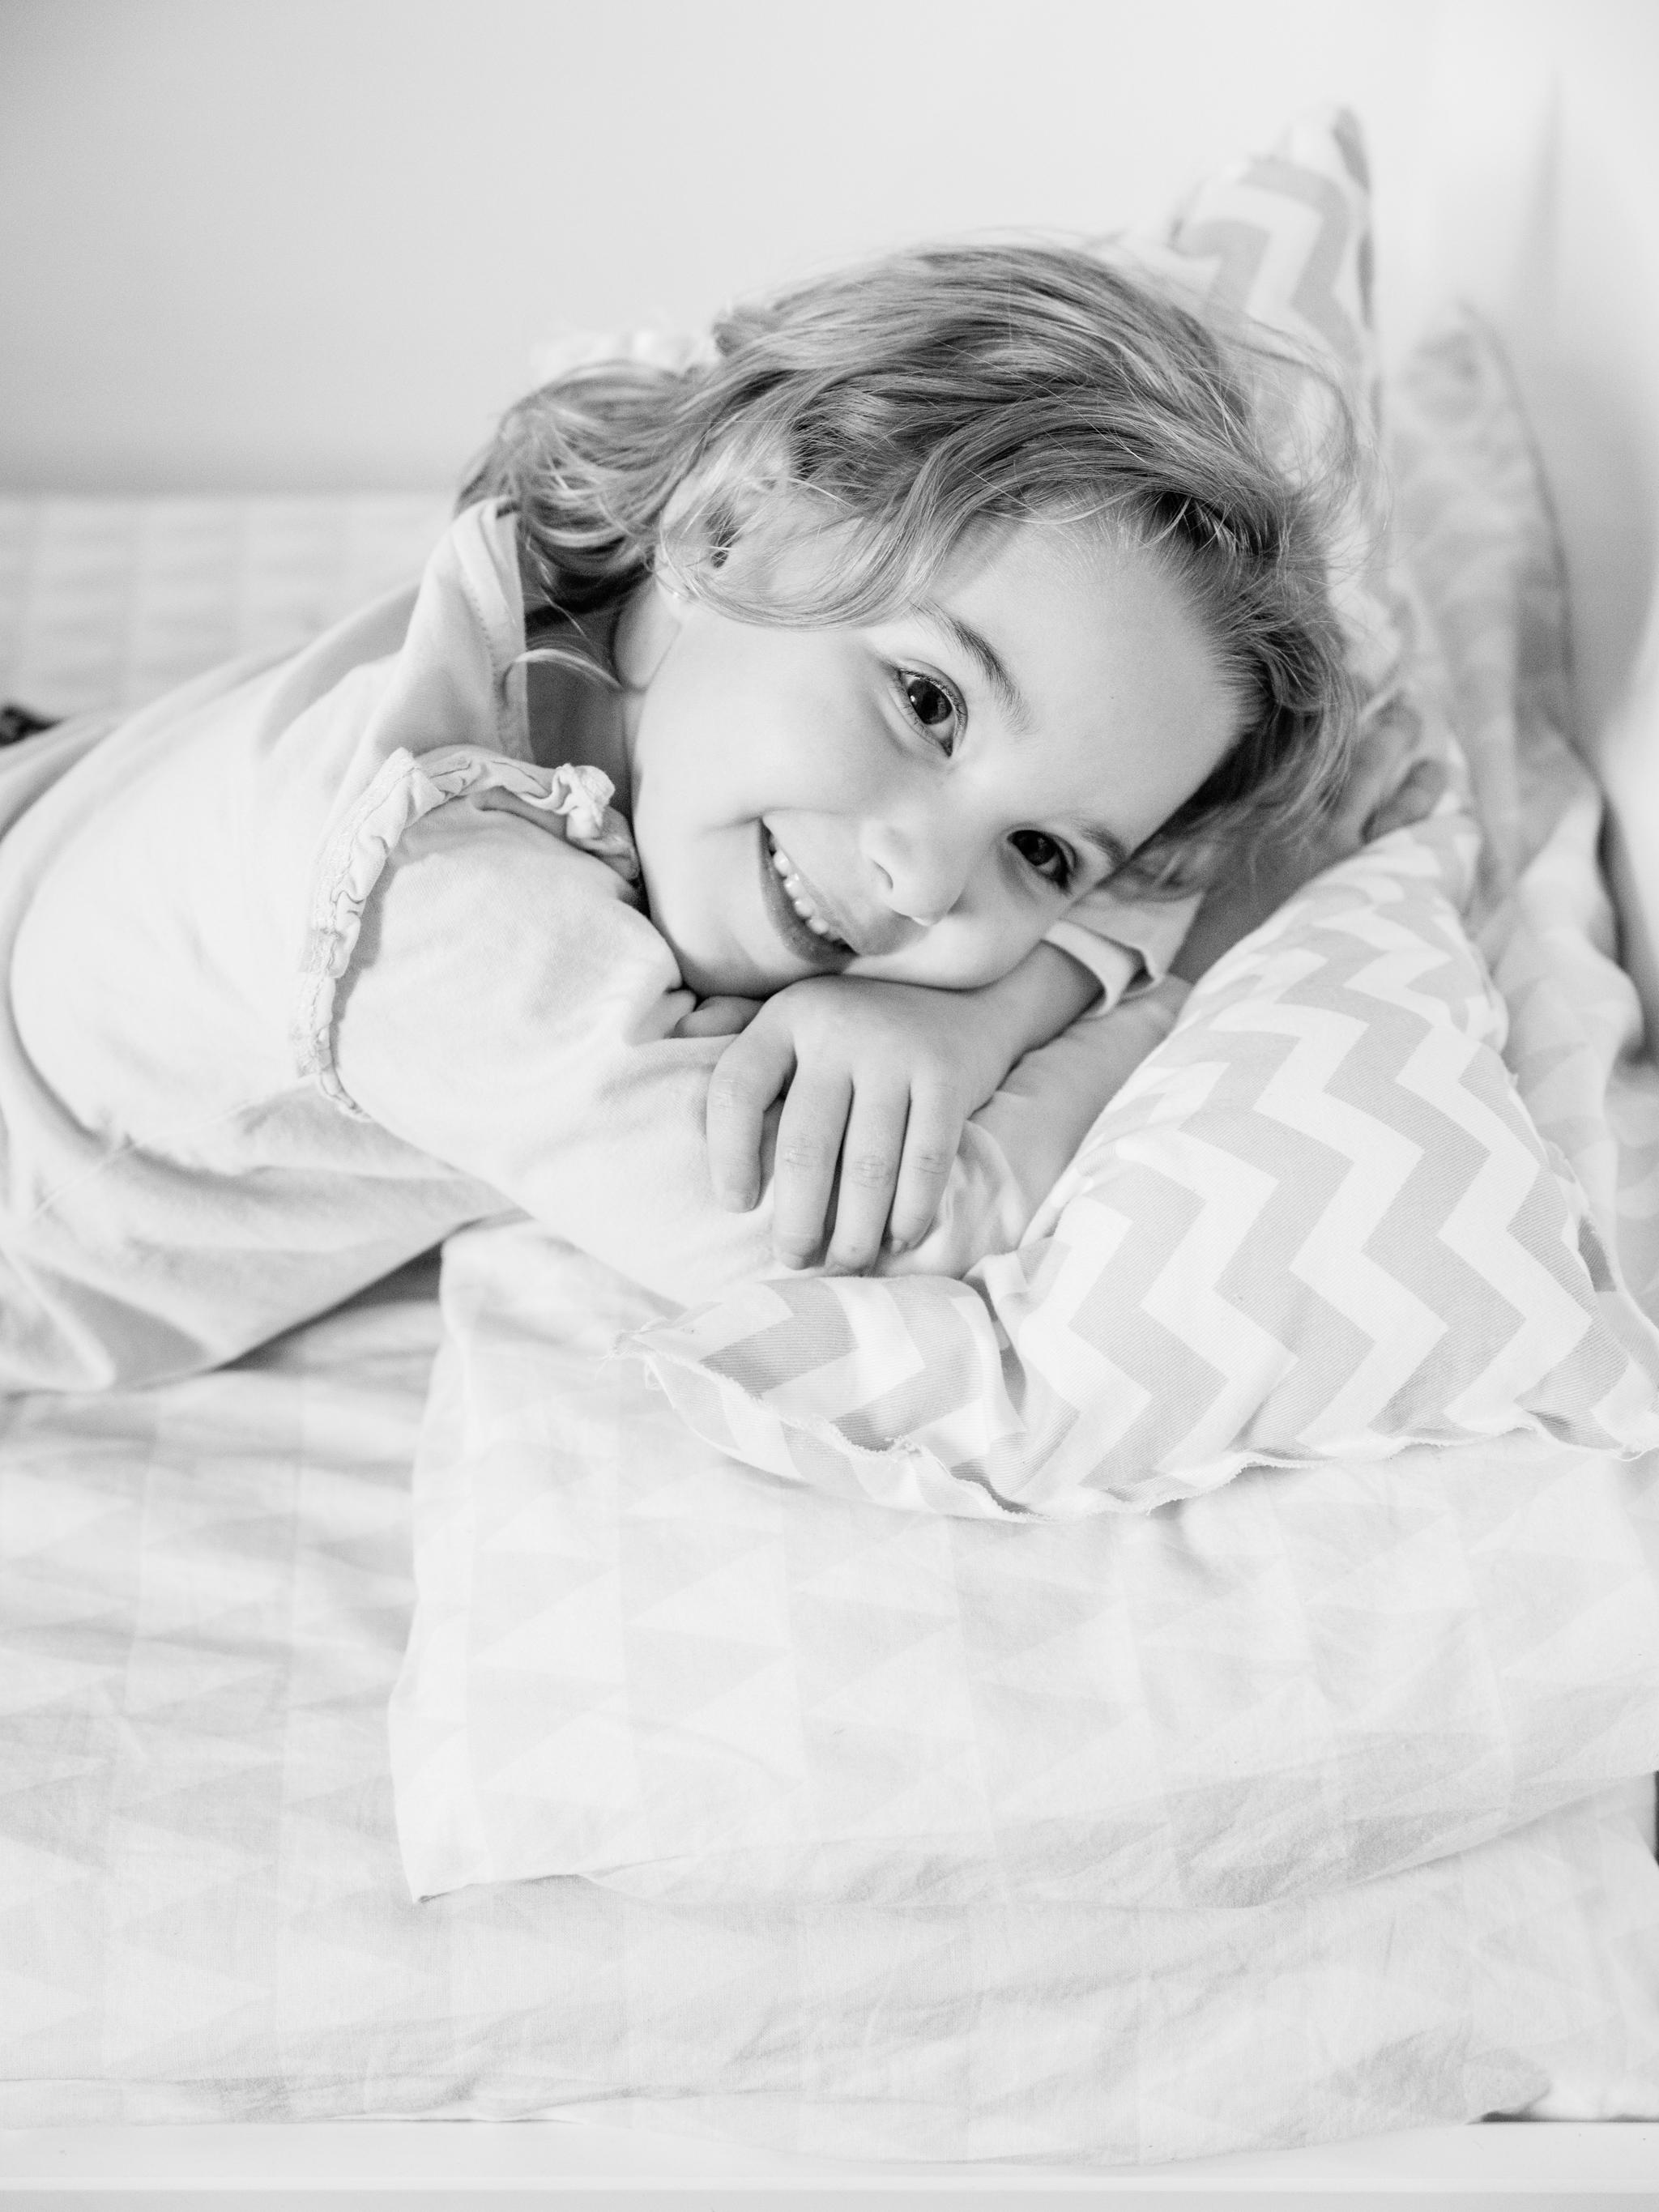 fotografia-infantil-familiar31.jpg